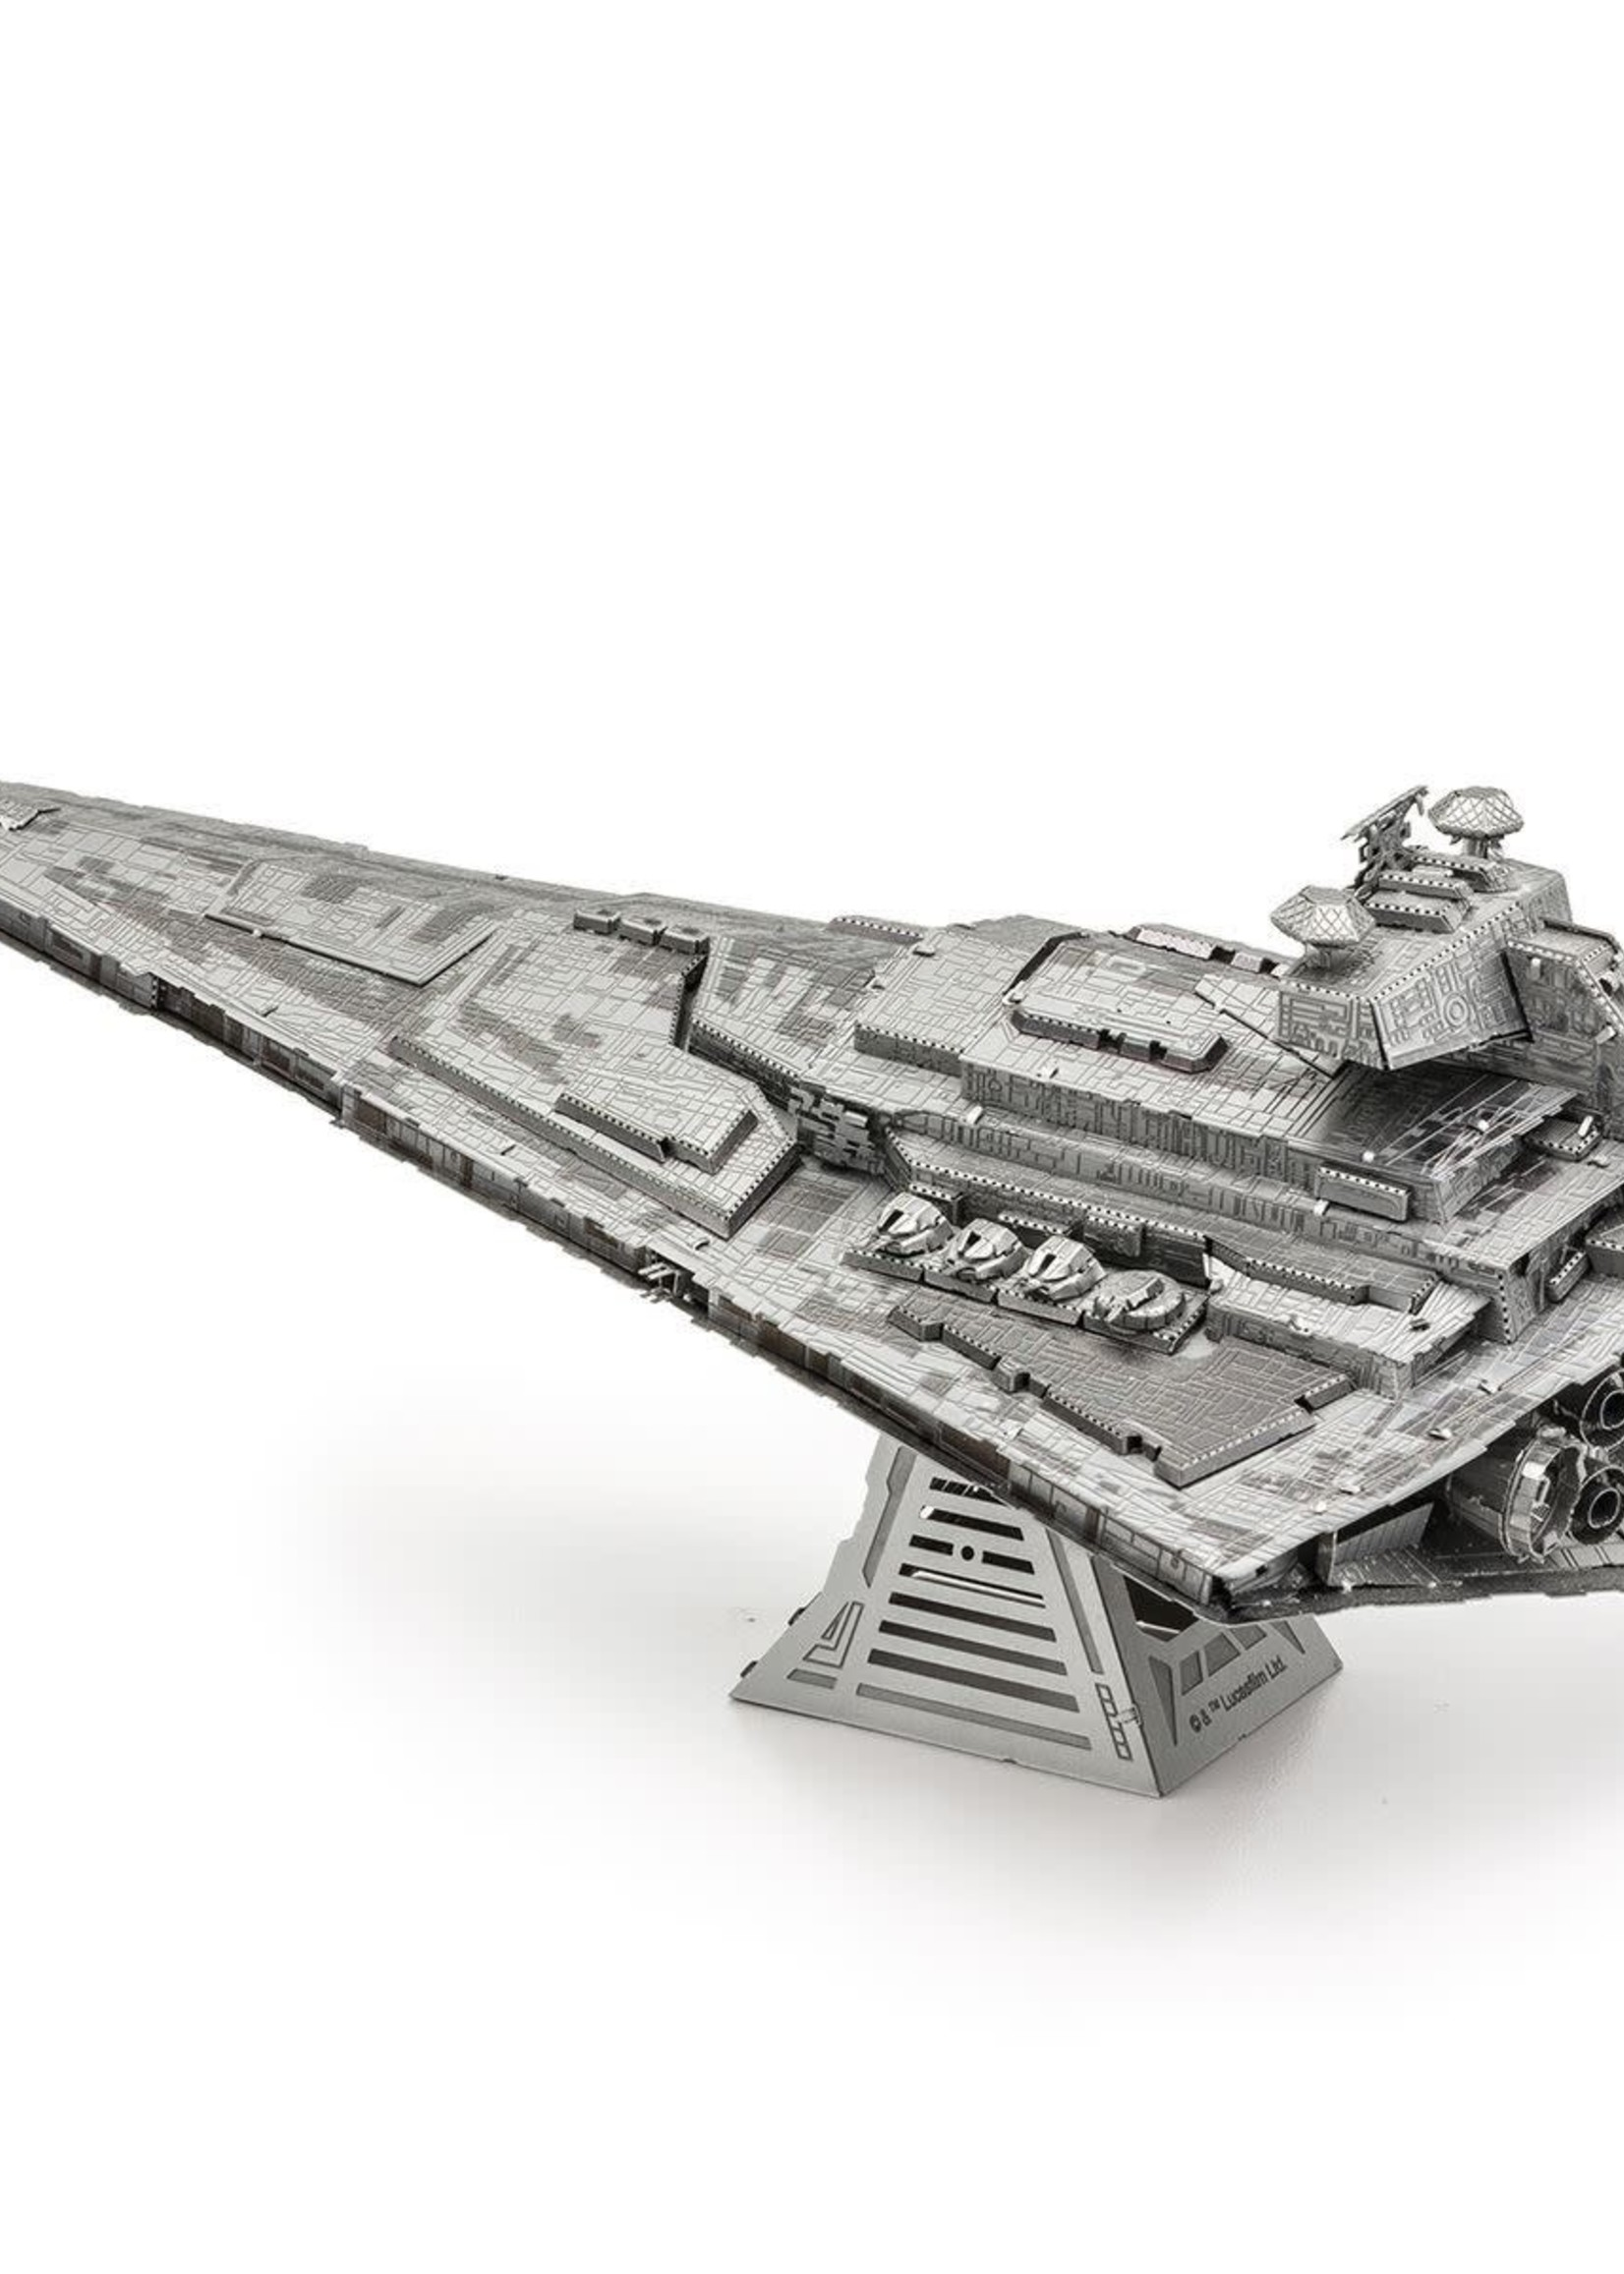 METAL EARTH Imperial Star Destroyer - COLOR Star Wars